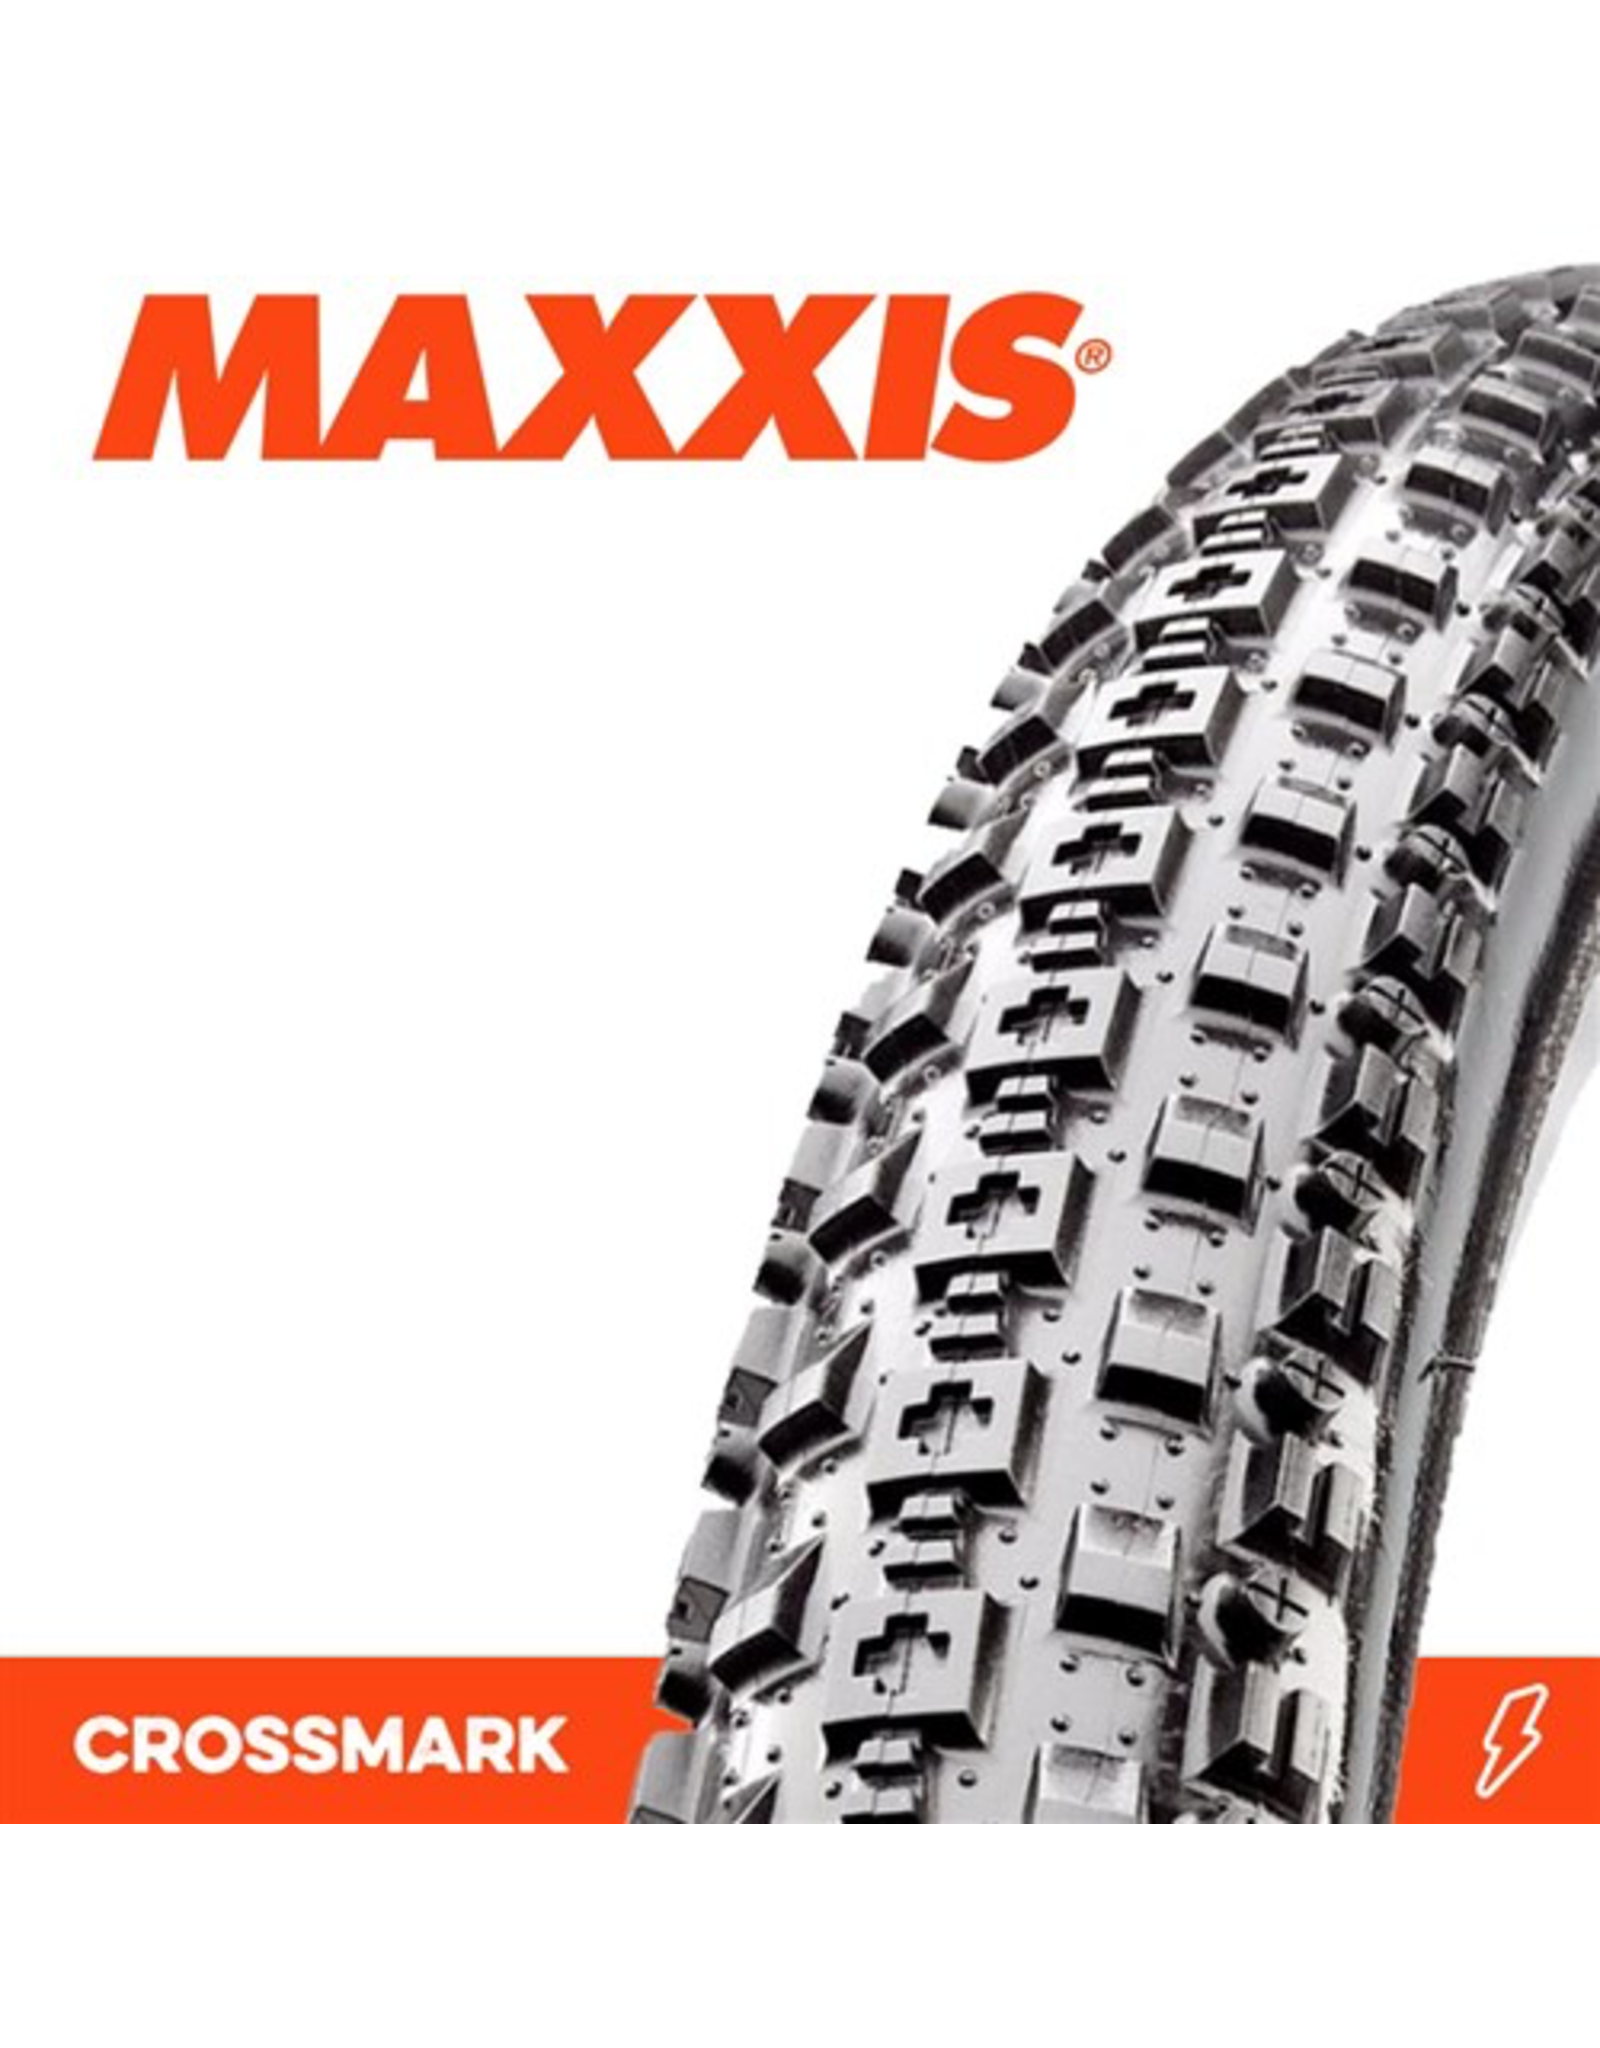 "MAXXIS TYRE MAXXIS CROSSMARK 26 X 2.25"" WIRE BEAD 60TPI"